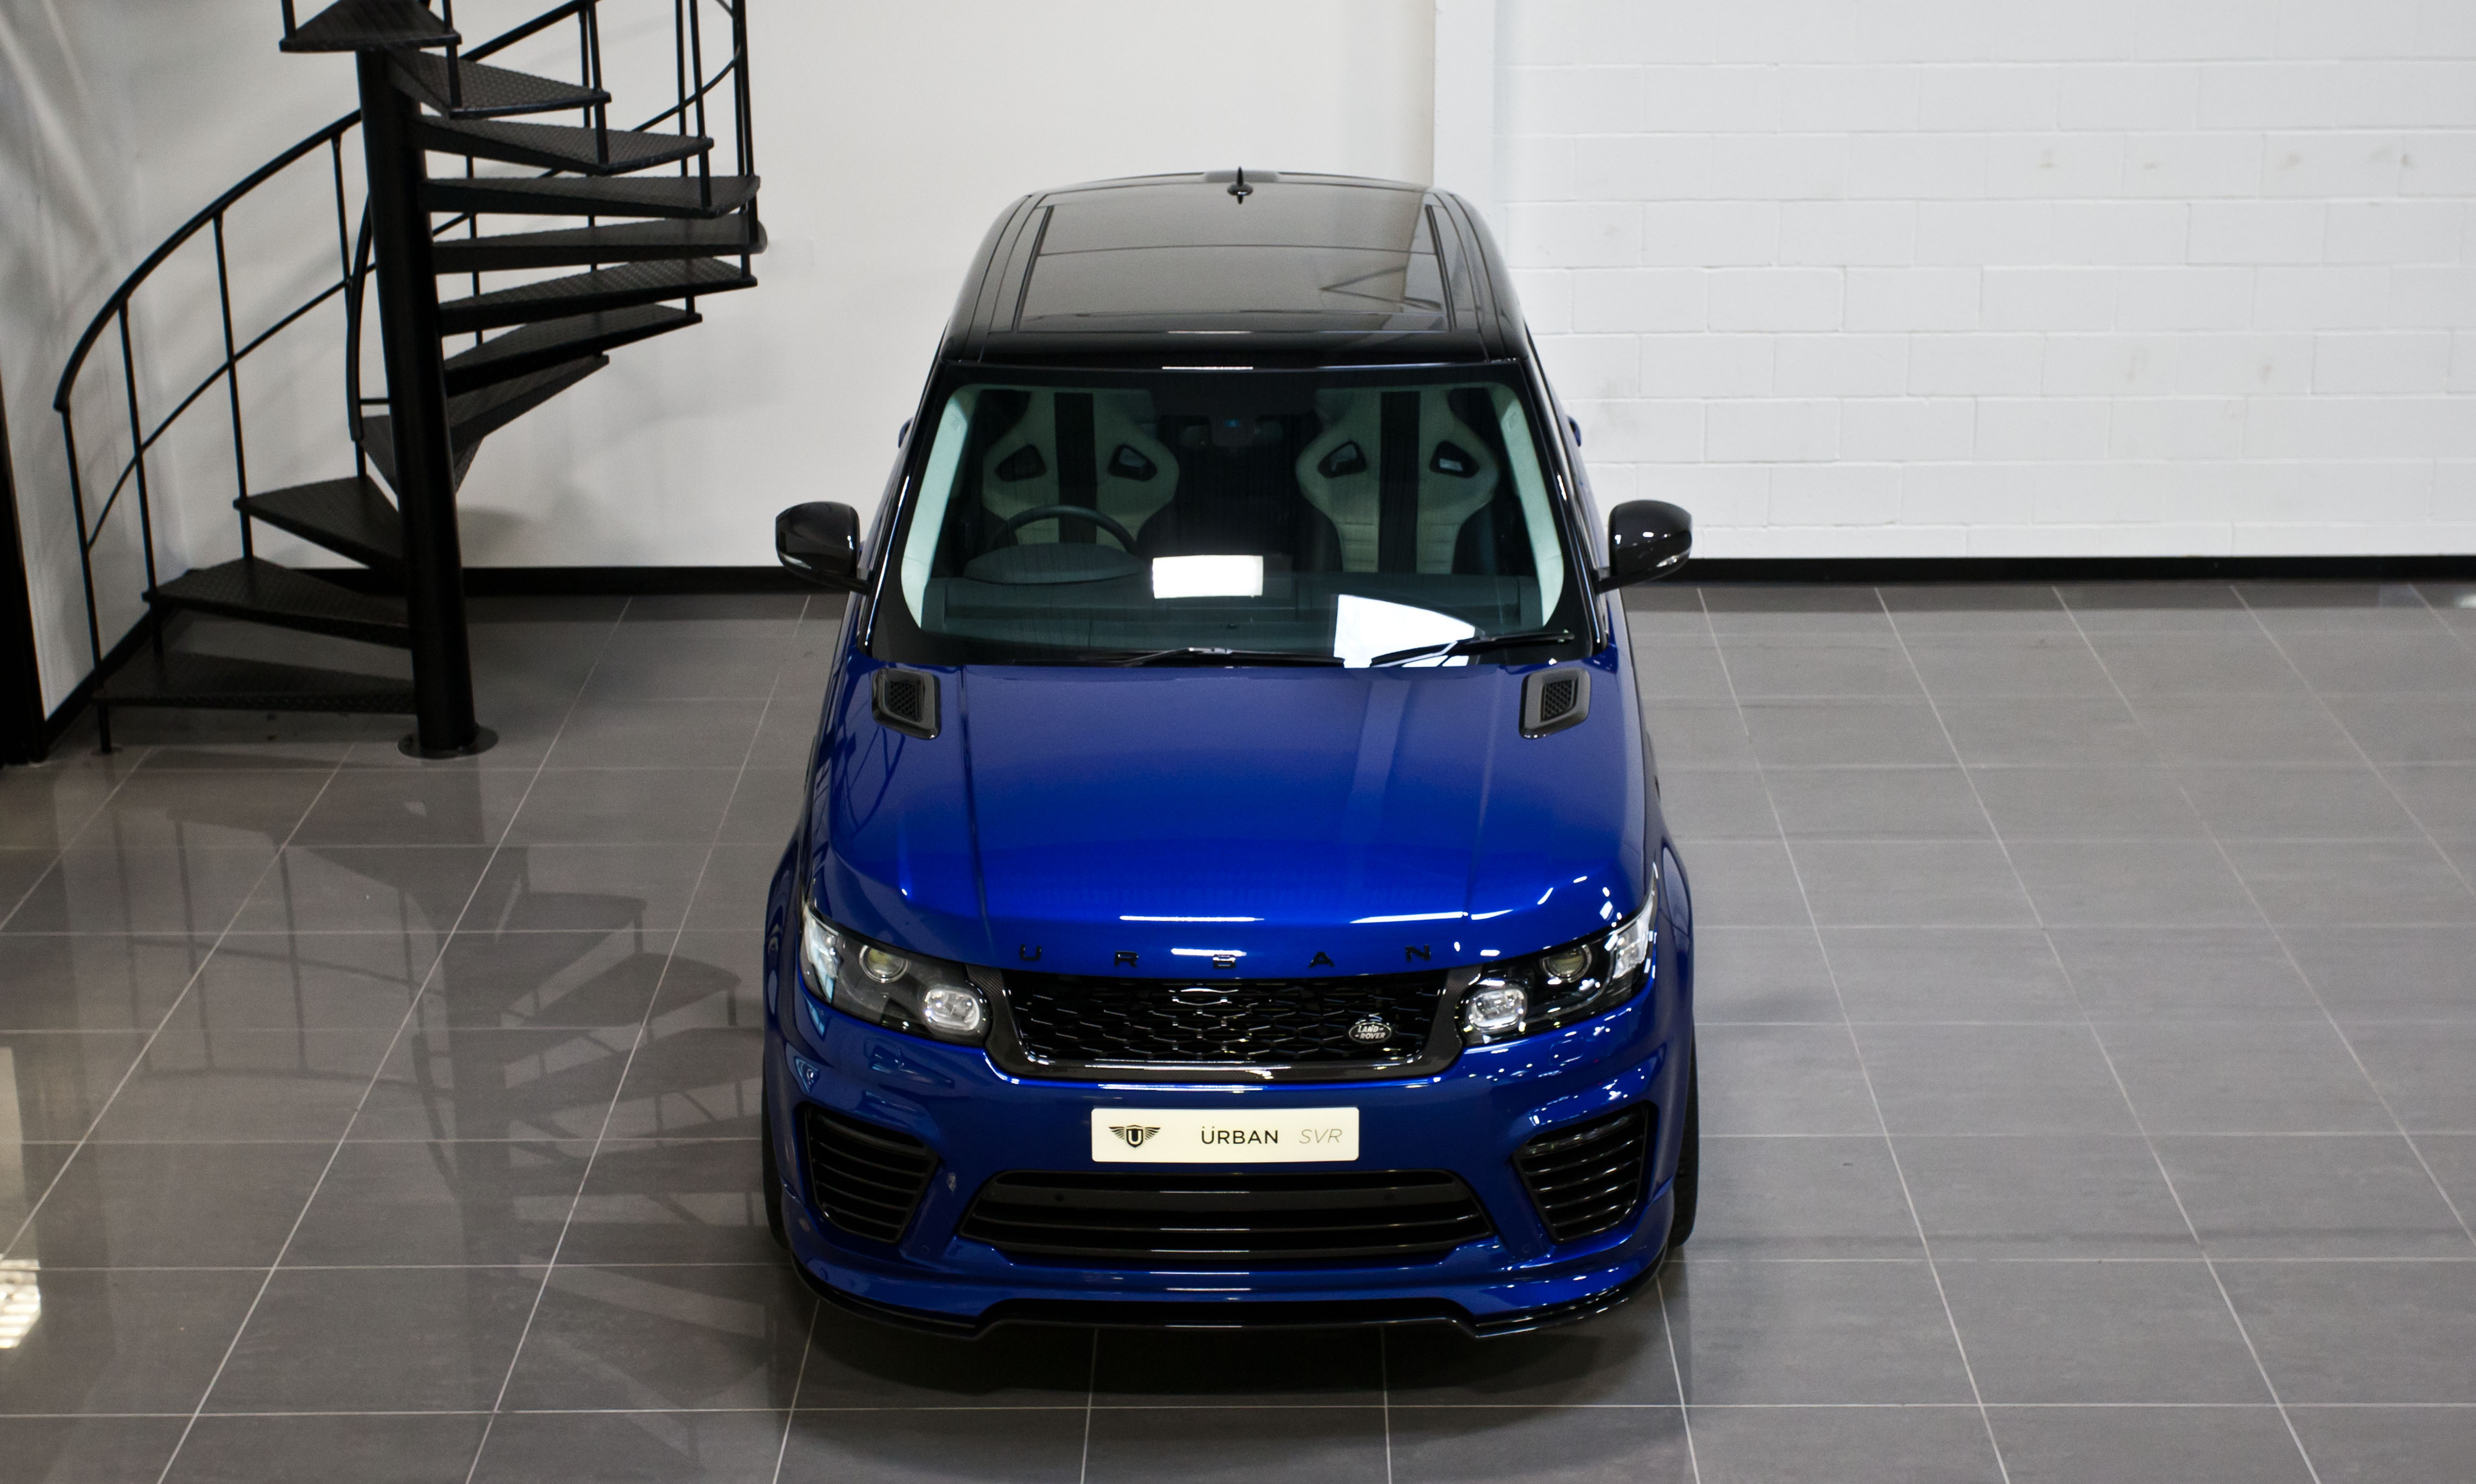 Urban v2 SVR Estoril Blue6